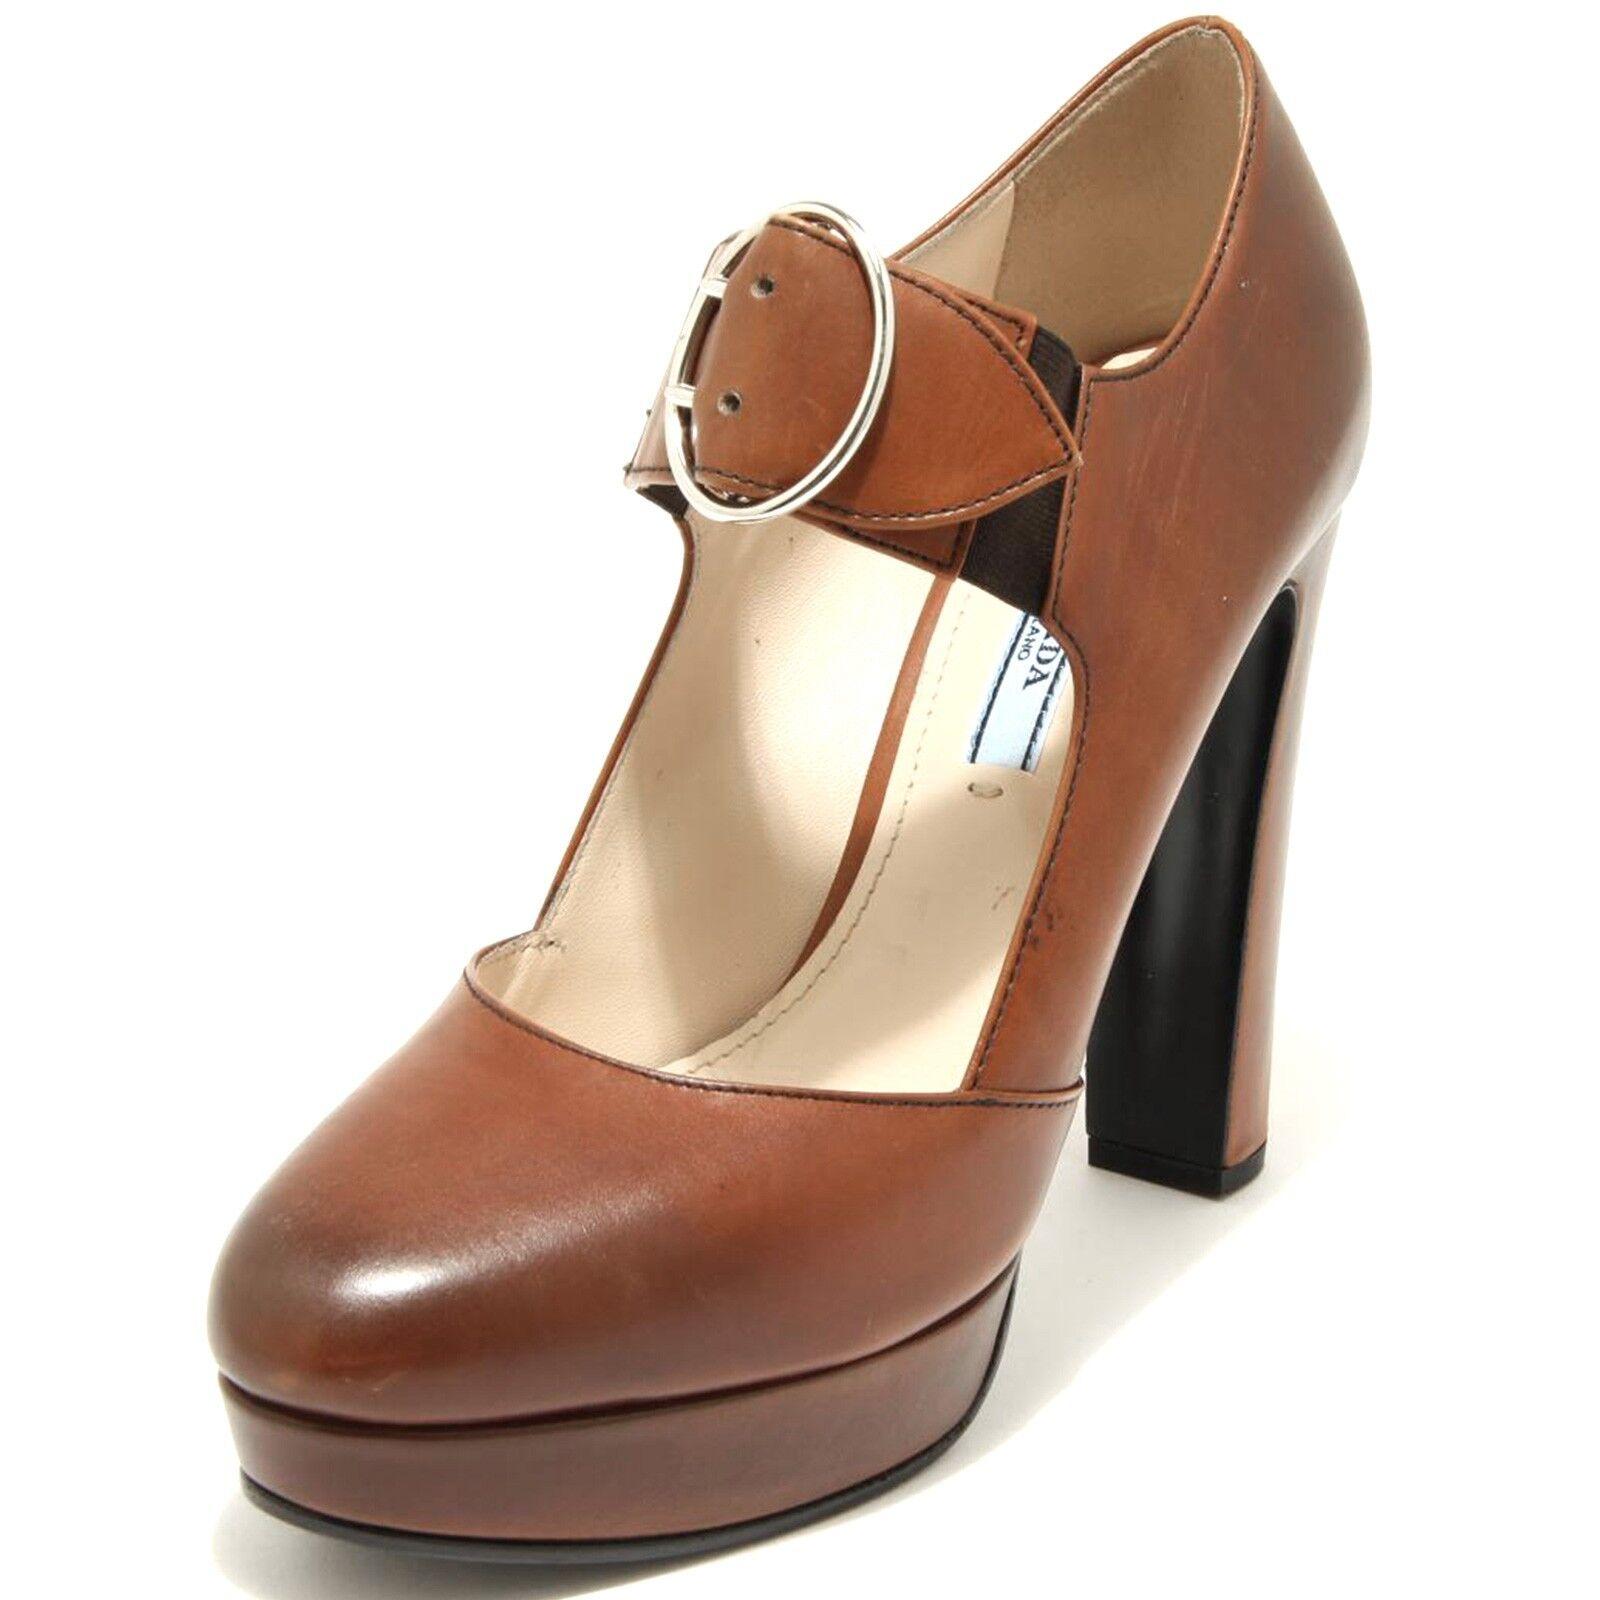 2242g decollete Prada betis (no Box) Scarpa Scarpa Scarpa mujer zapatos mujer  centro comercial de moda